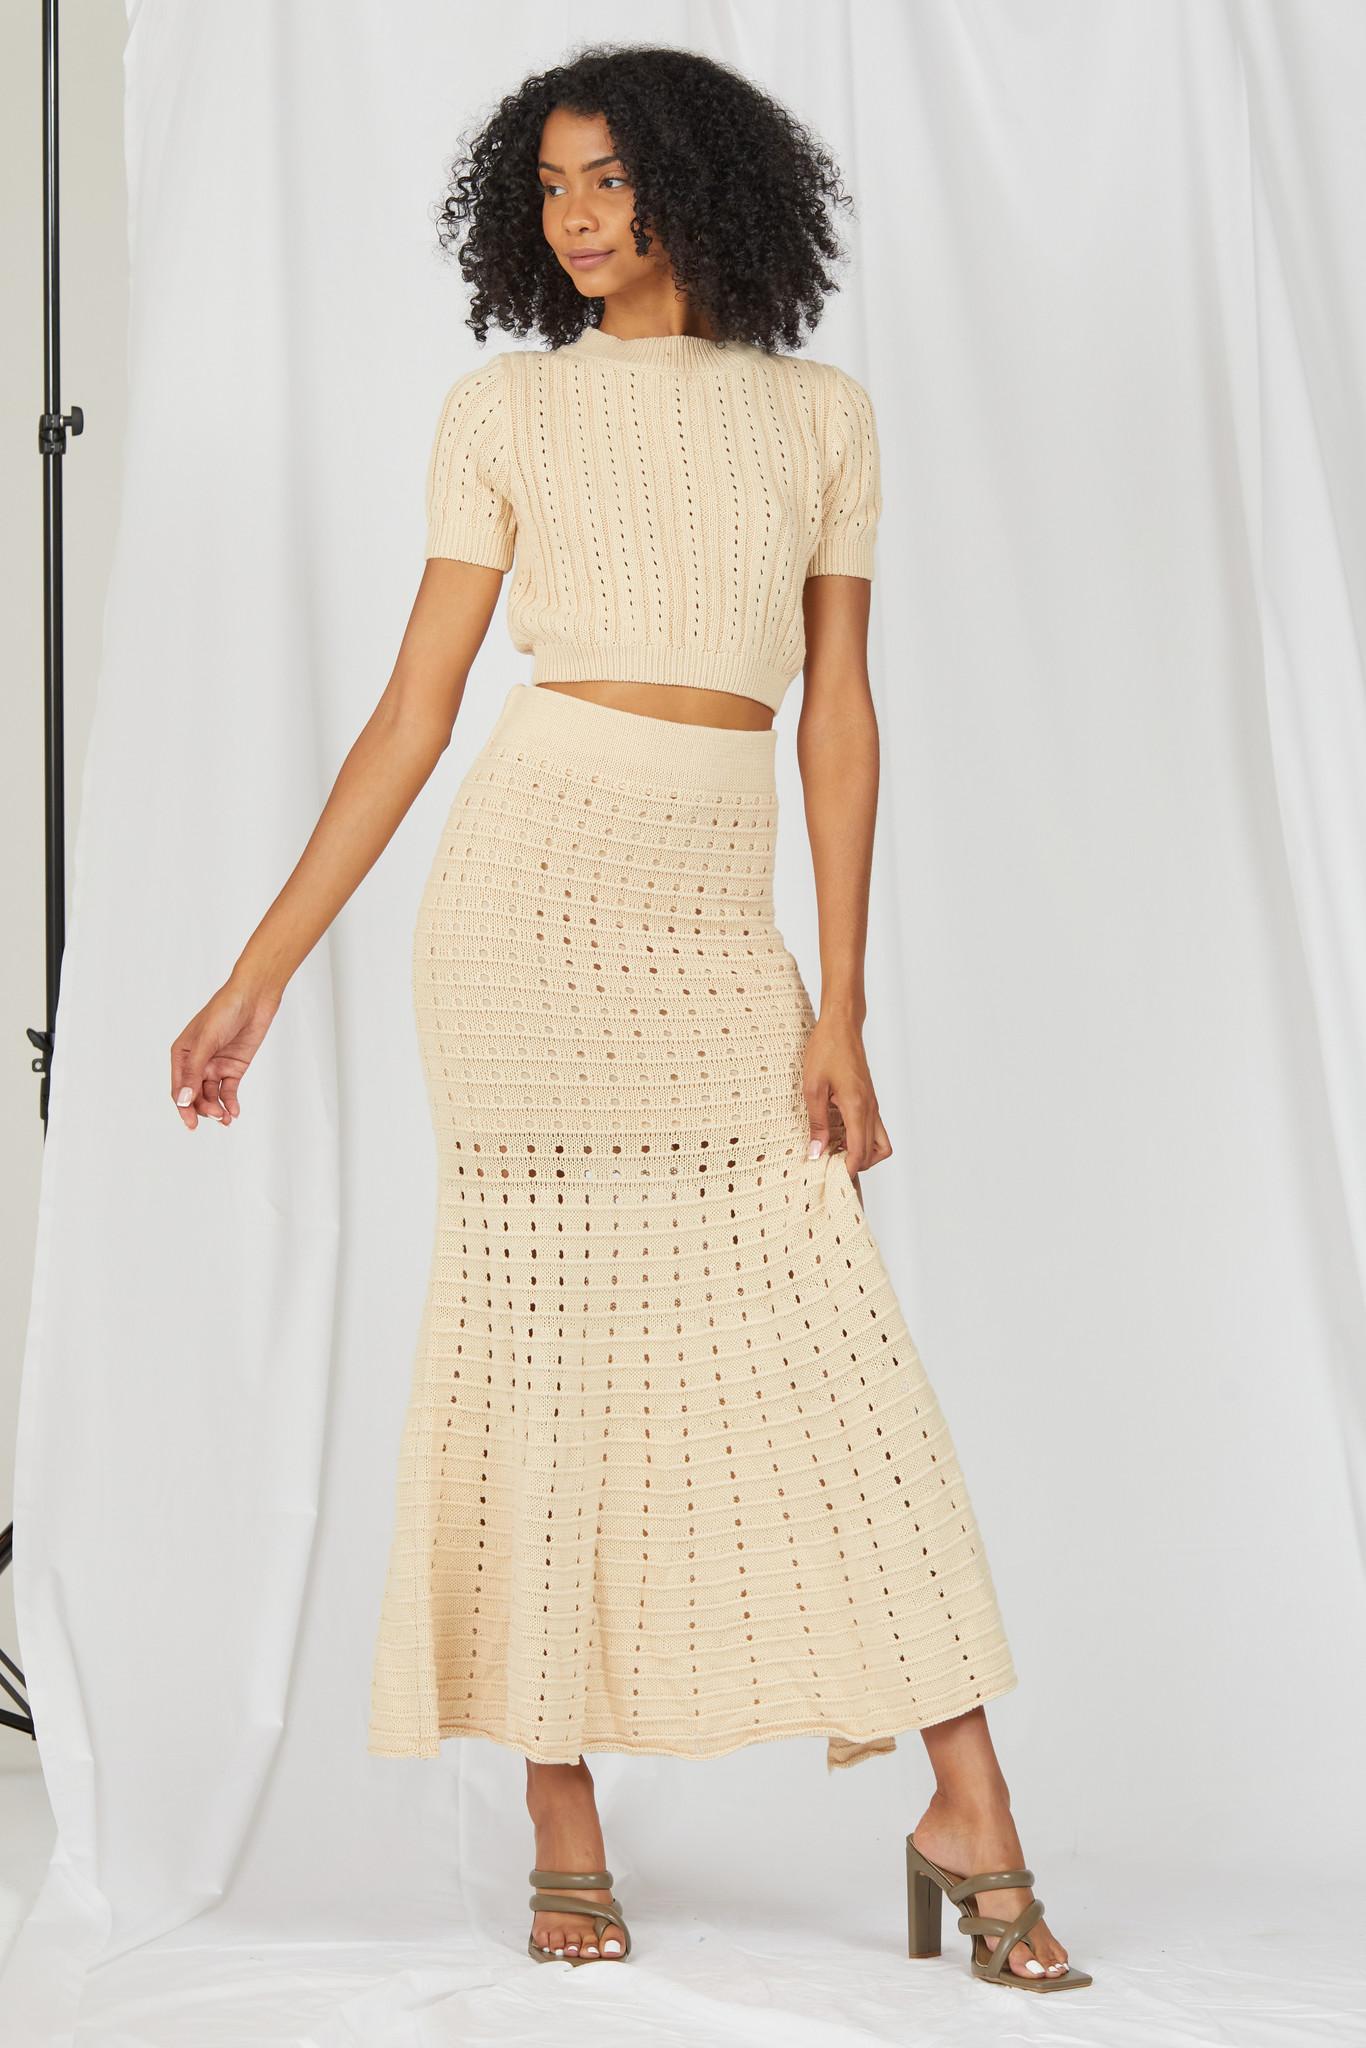 Skirt What A Darling Skirt